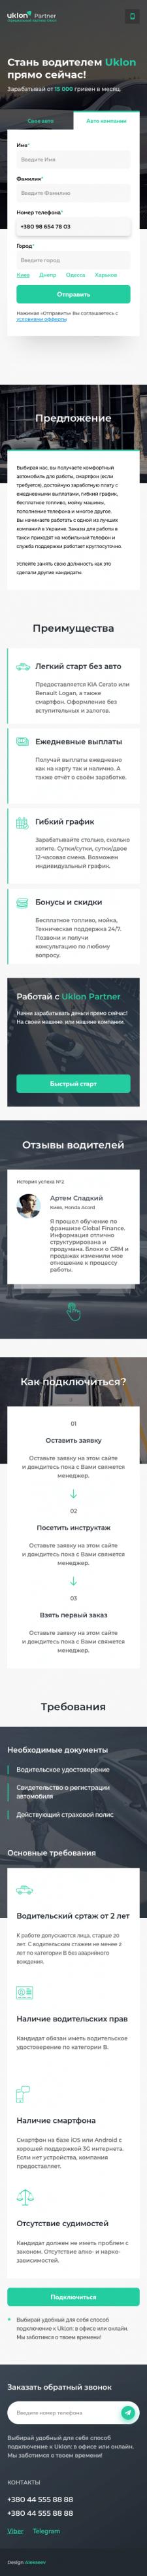 Uklon Partner for drivers (mobile)